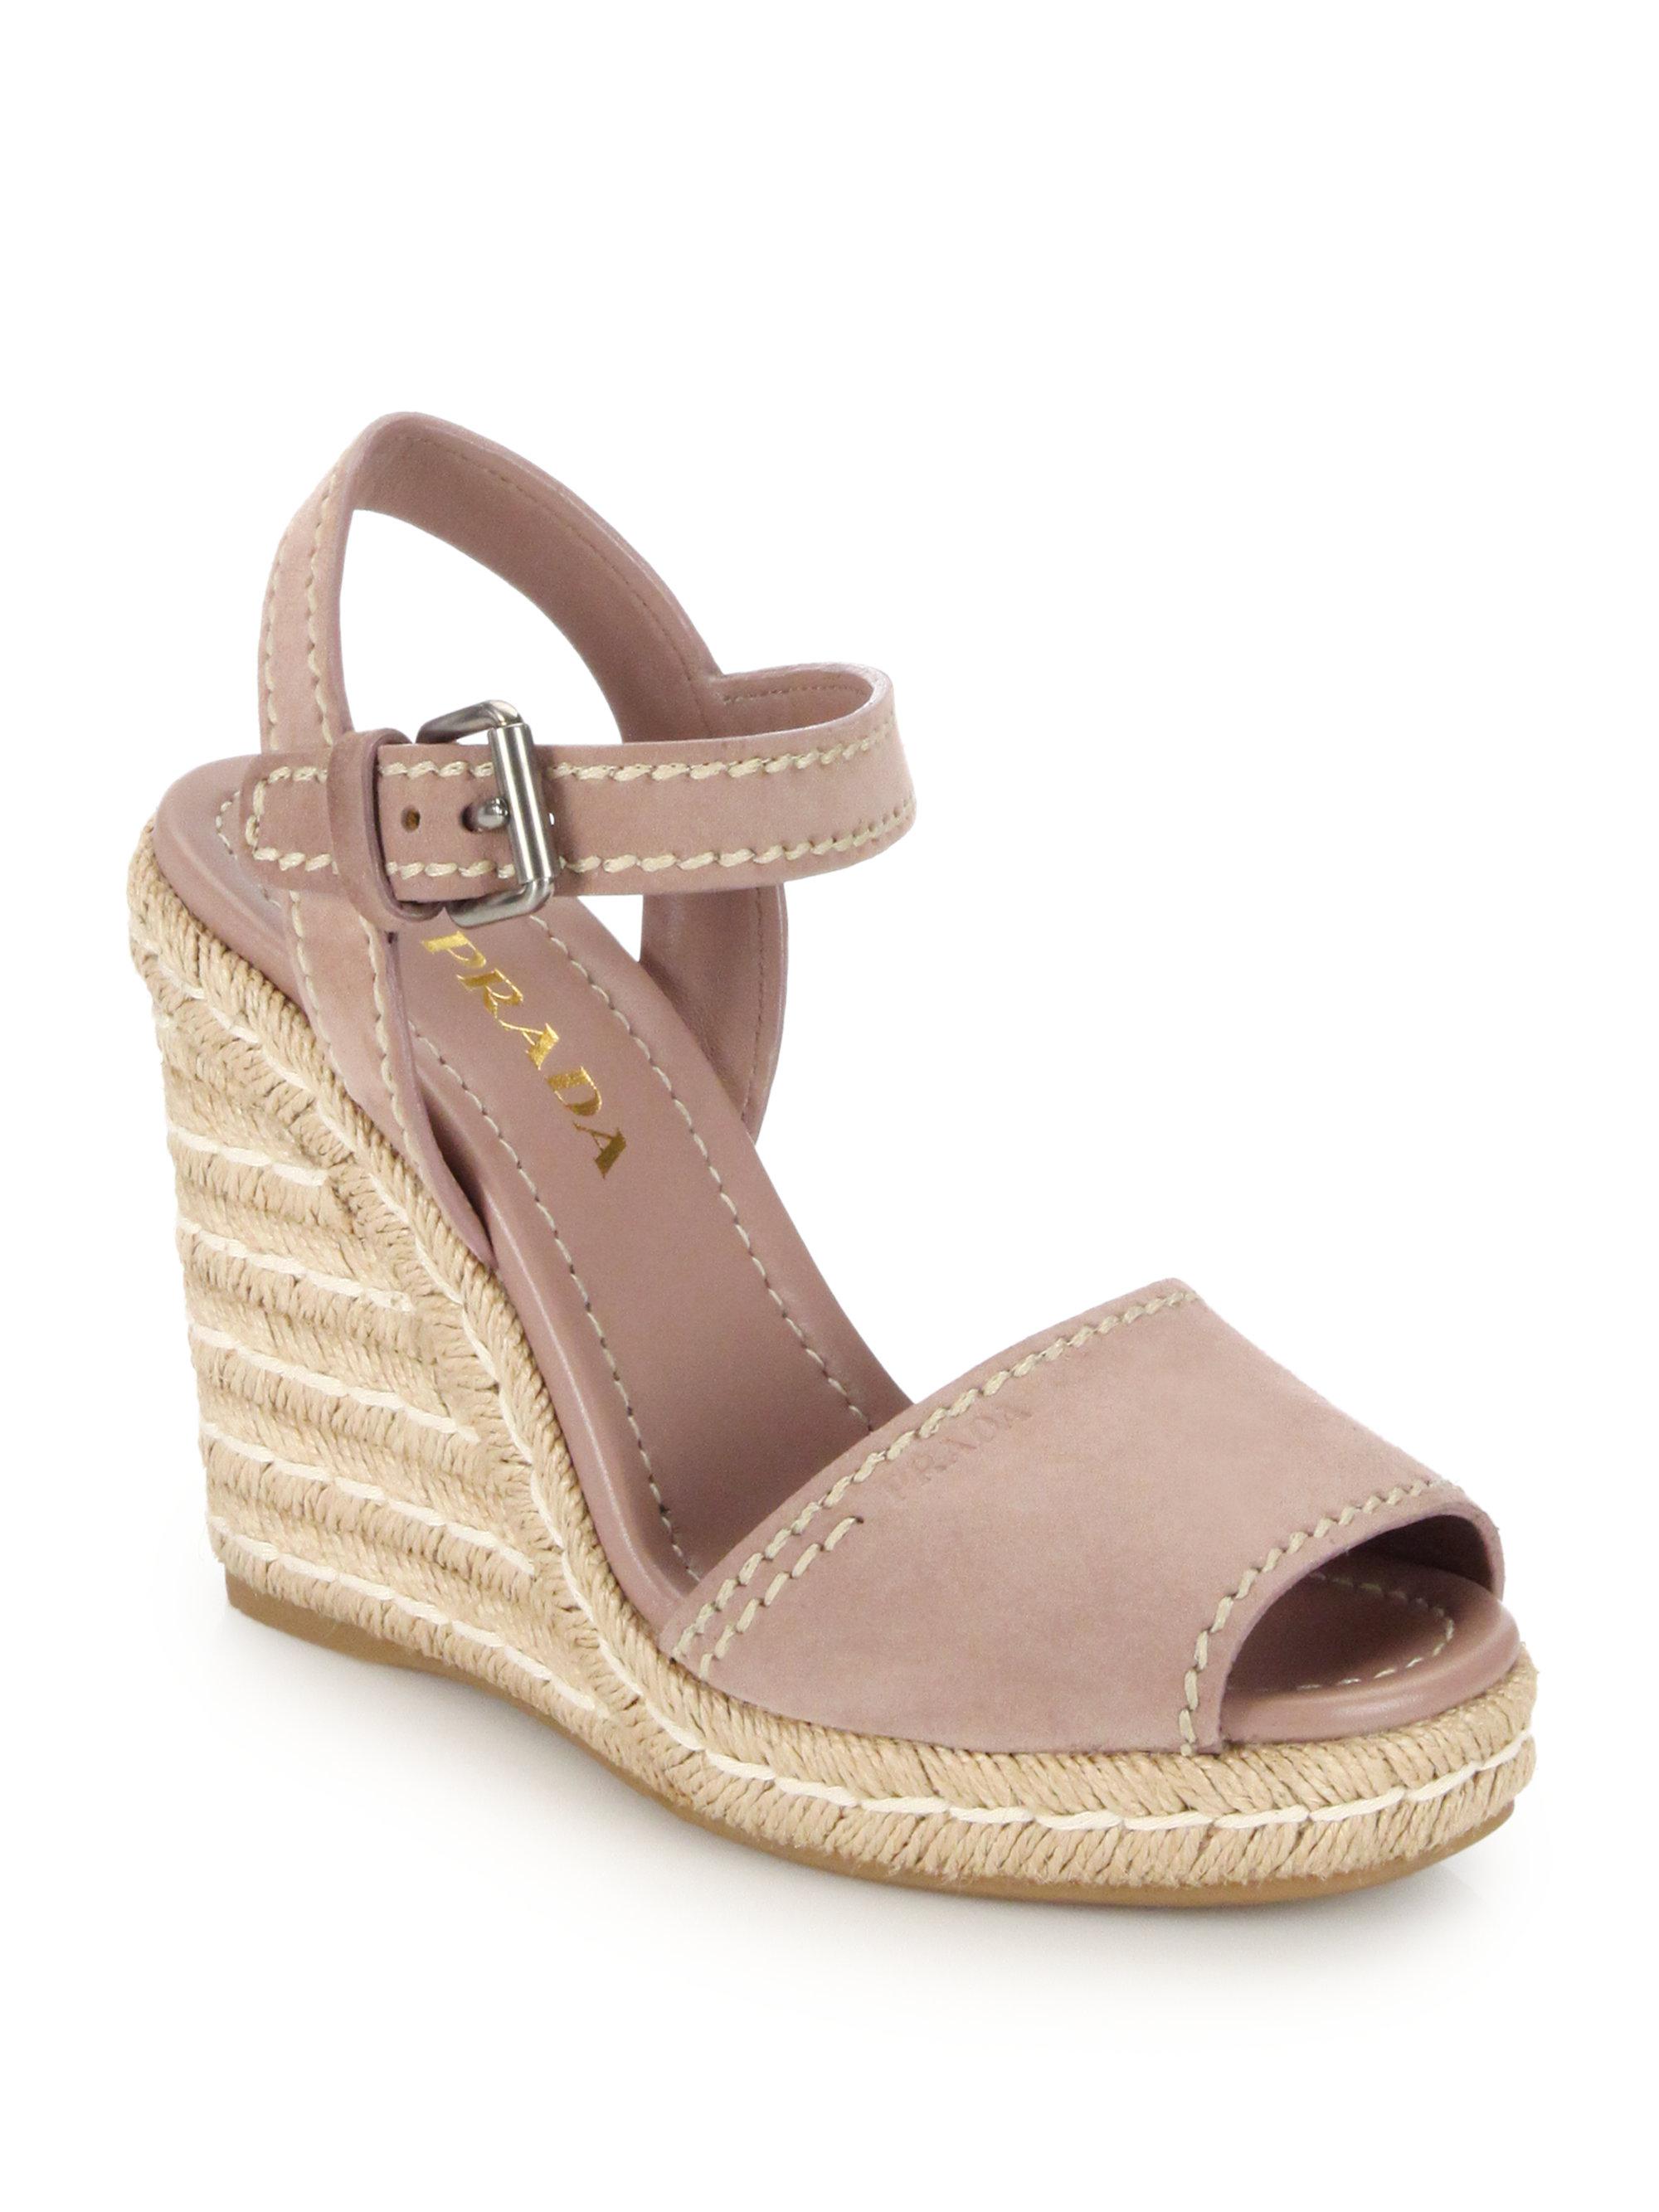 35524043085f Lyst - Prada Suede Peep-toe Espadrille Sandals in Pink